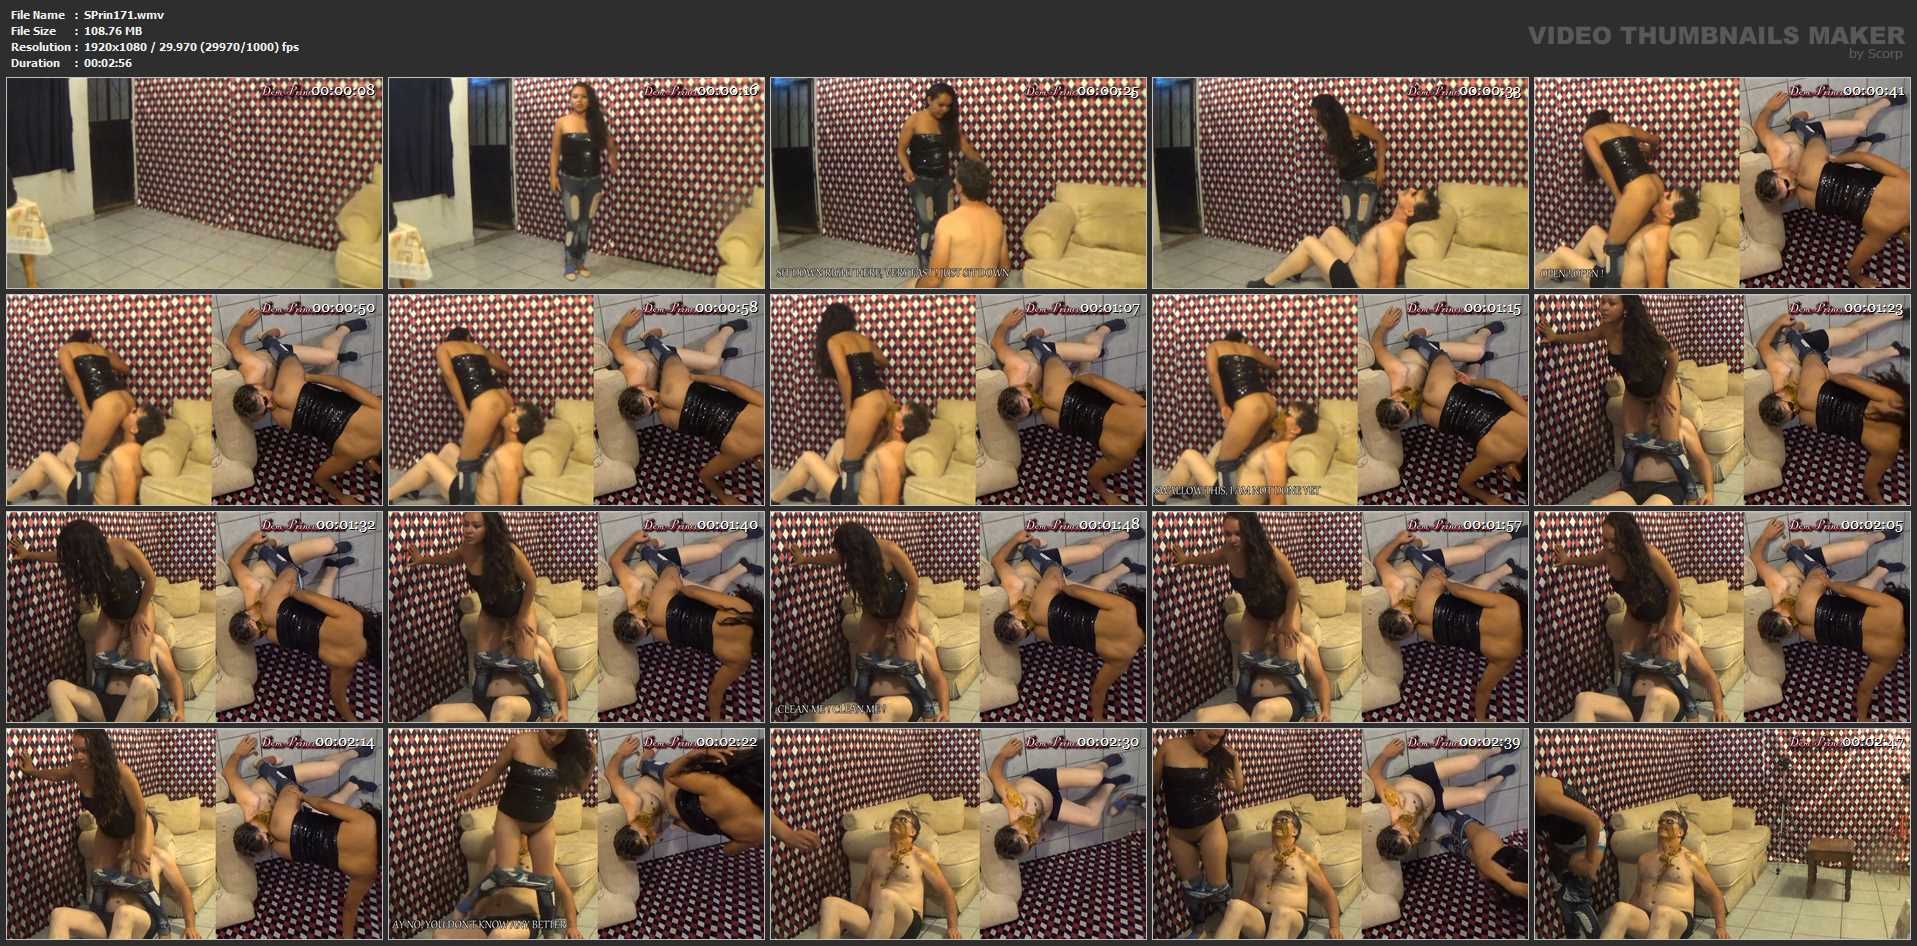 [SCAT-PRINCESS] Hurry Pig, sit down right here [FULL HD][1080p][WMV]